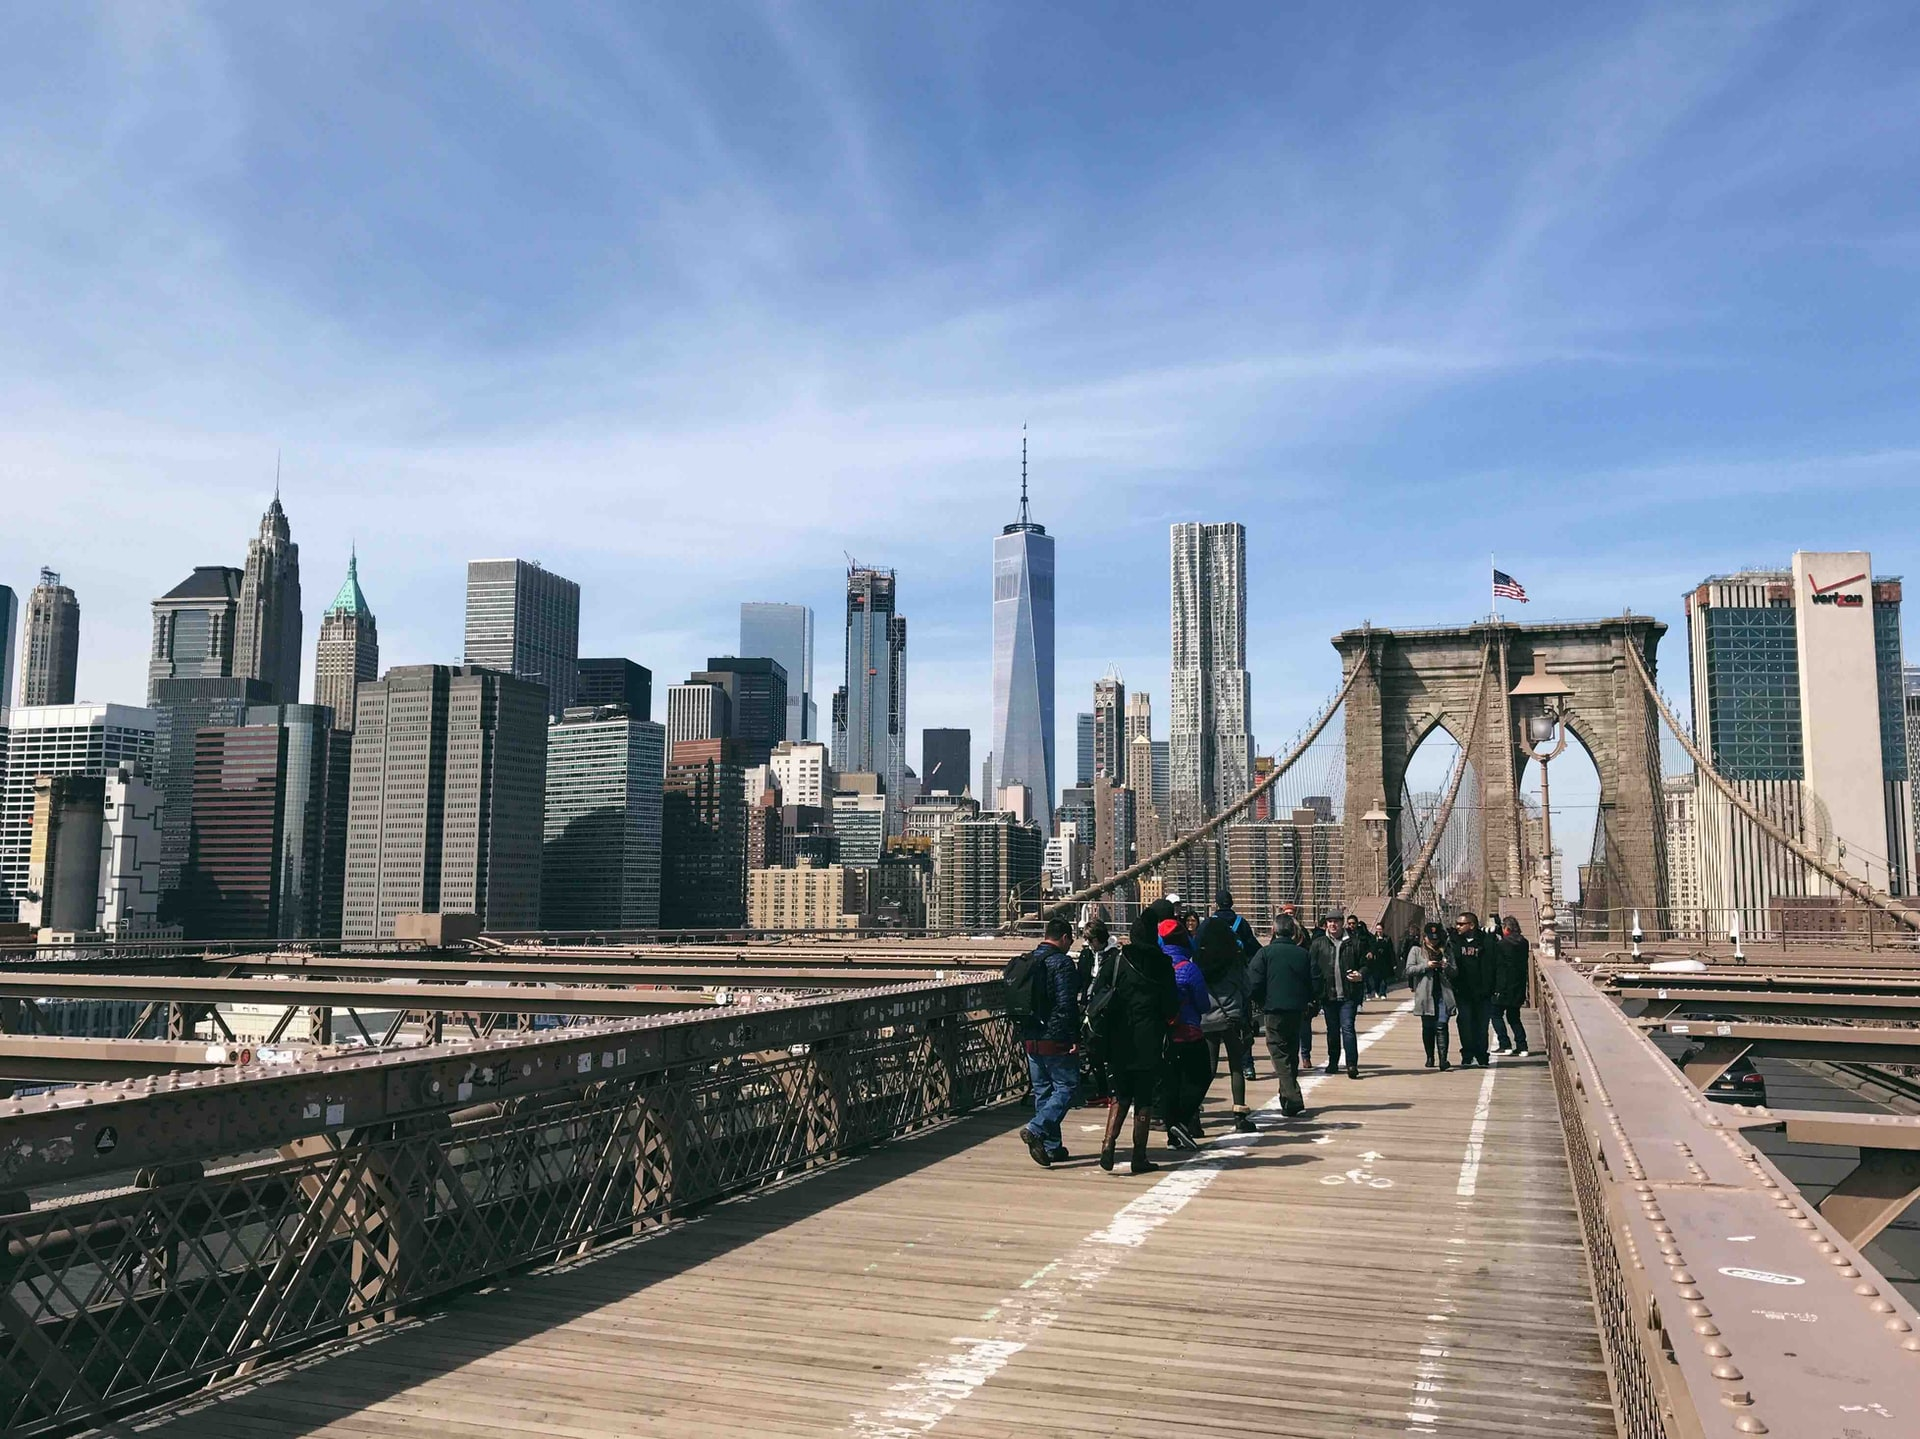 Uitzicht op Manhattan vanaf Brooklyn Bridge (foto: Ethan Bykerk)